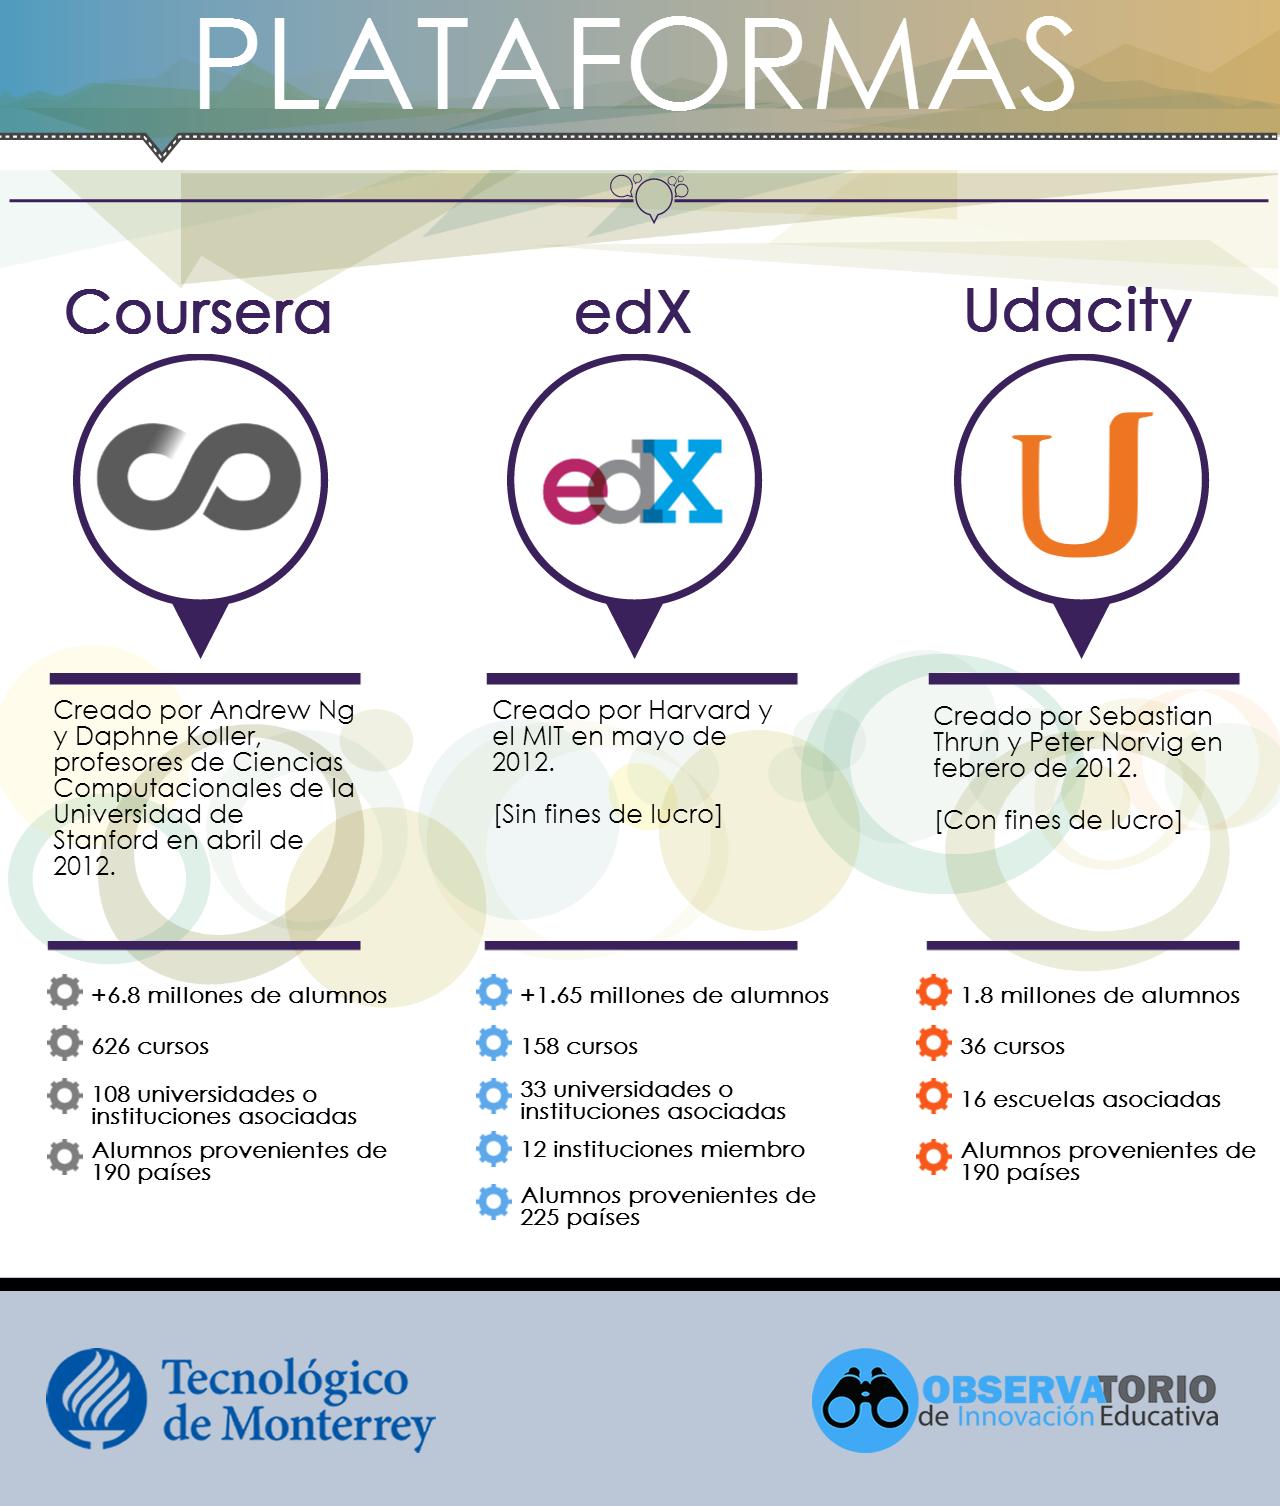 Plataformas MOOC